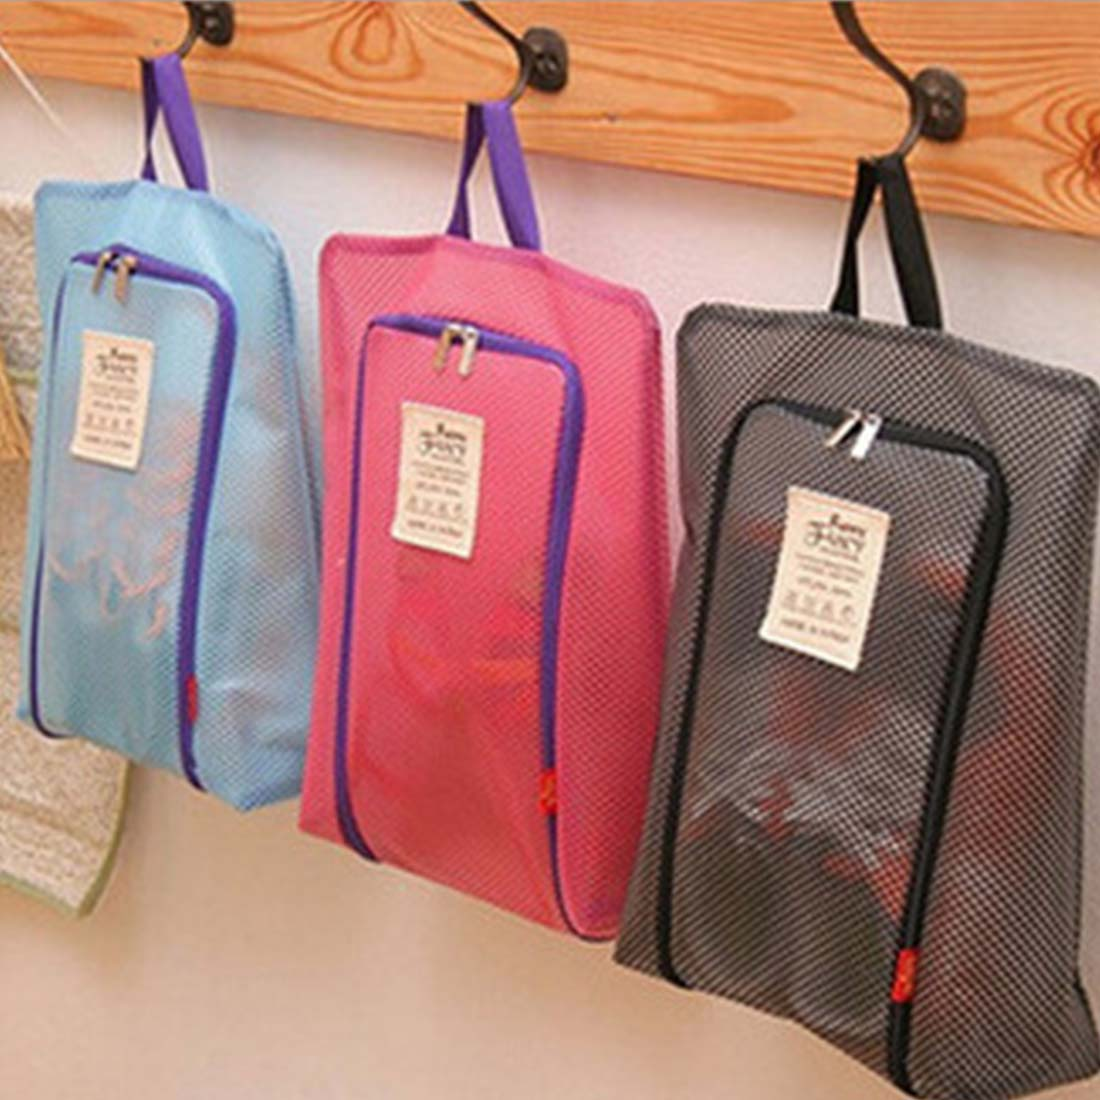 Shoes Storage Organizer Waterproof Basket women men bag travel Handbag Necessities items Accessories Supplies Product(China (Mainland))